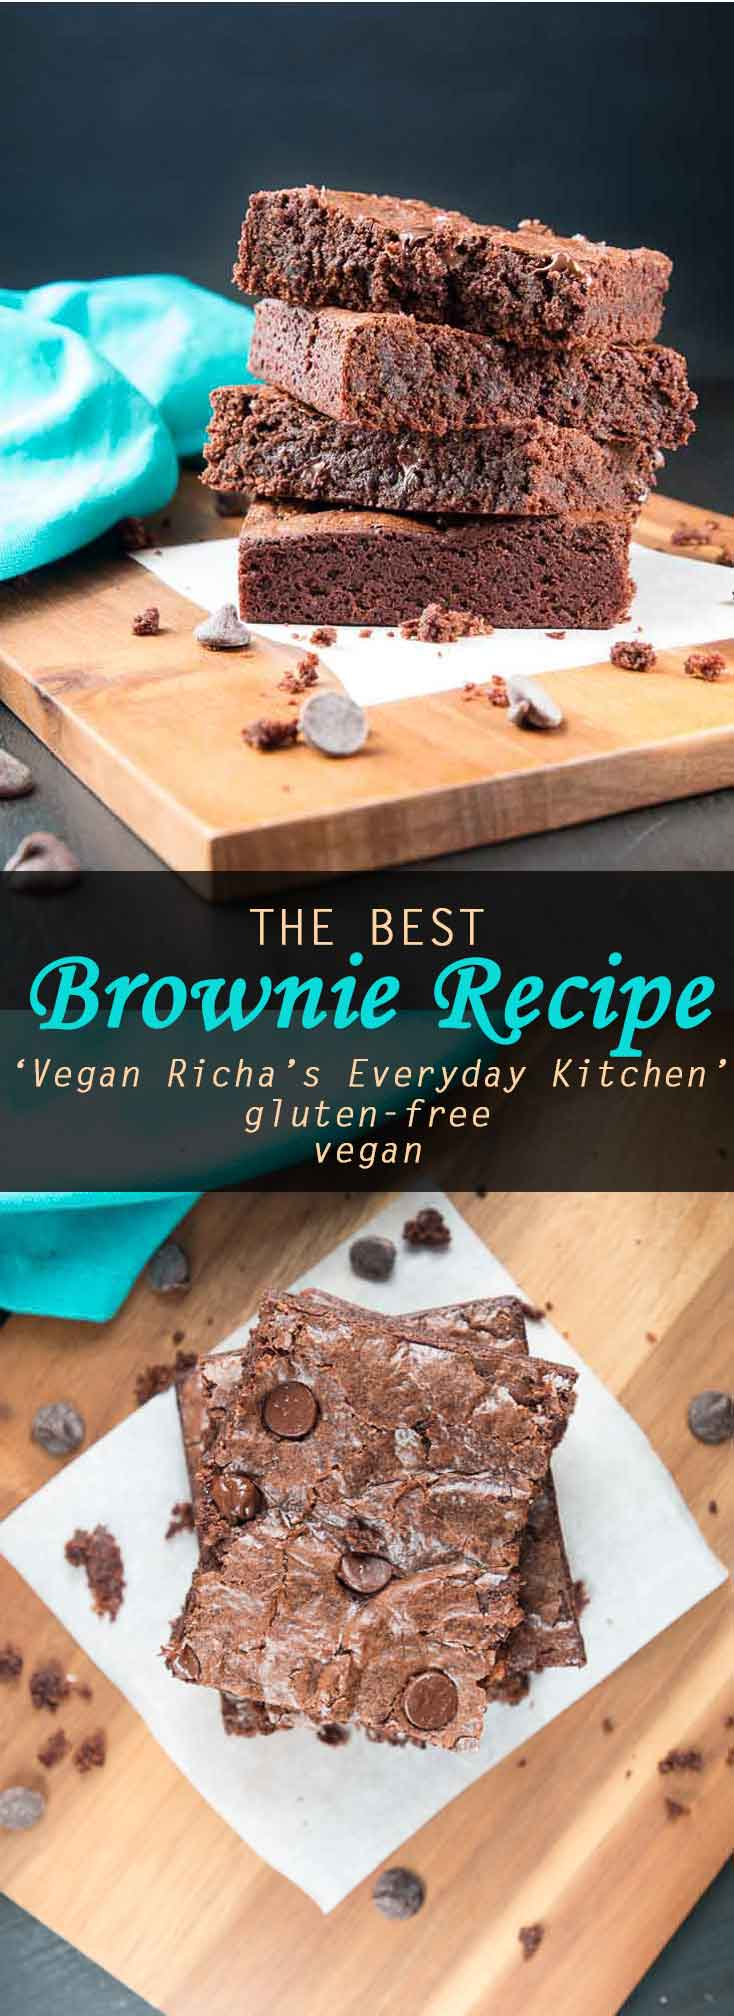 The Best Vegan Brownie Recipe from 'Vegan Richa's Everyday Kitchen' cookbook! #vegan #glutenfree | Vegetarian Gastronomy | www.VegetarianGastronomy.com